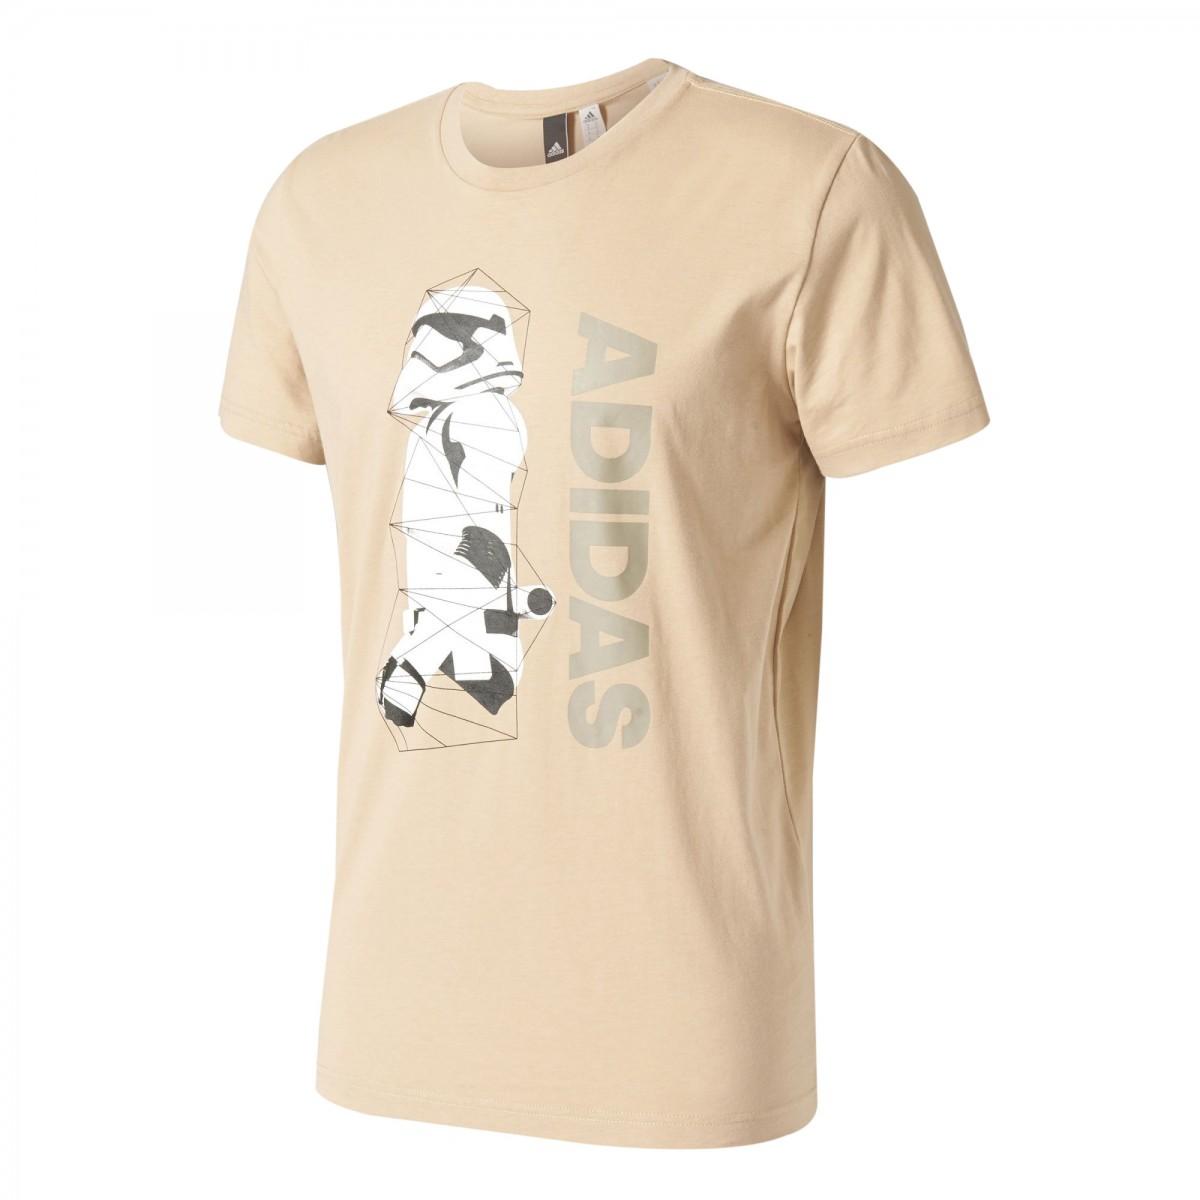 Camiseta Masculina Adidas Star Wars Stormtrooper BK2841 Bege 33592c4b76017